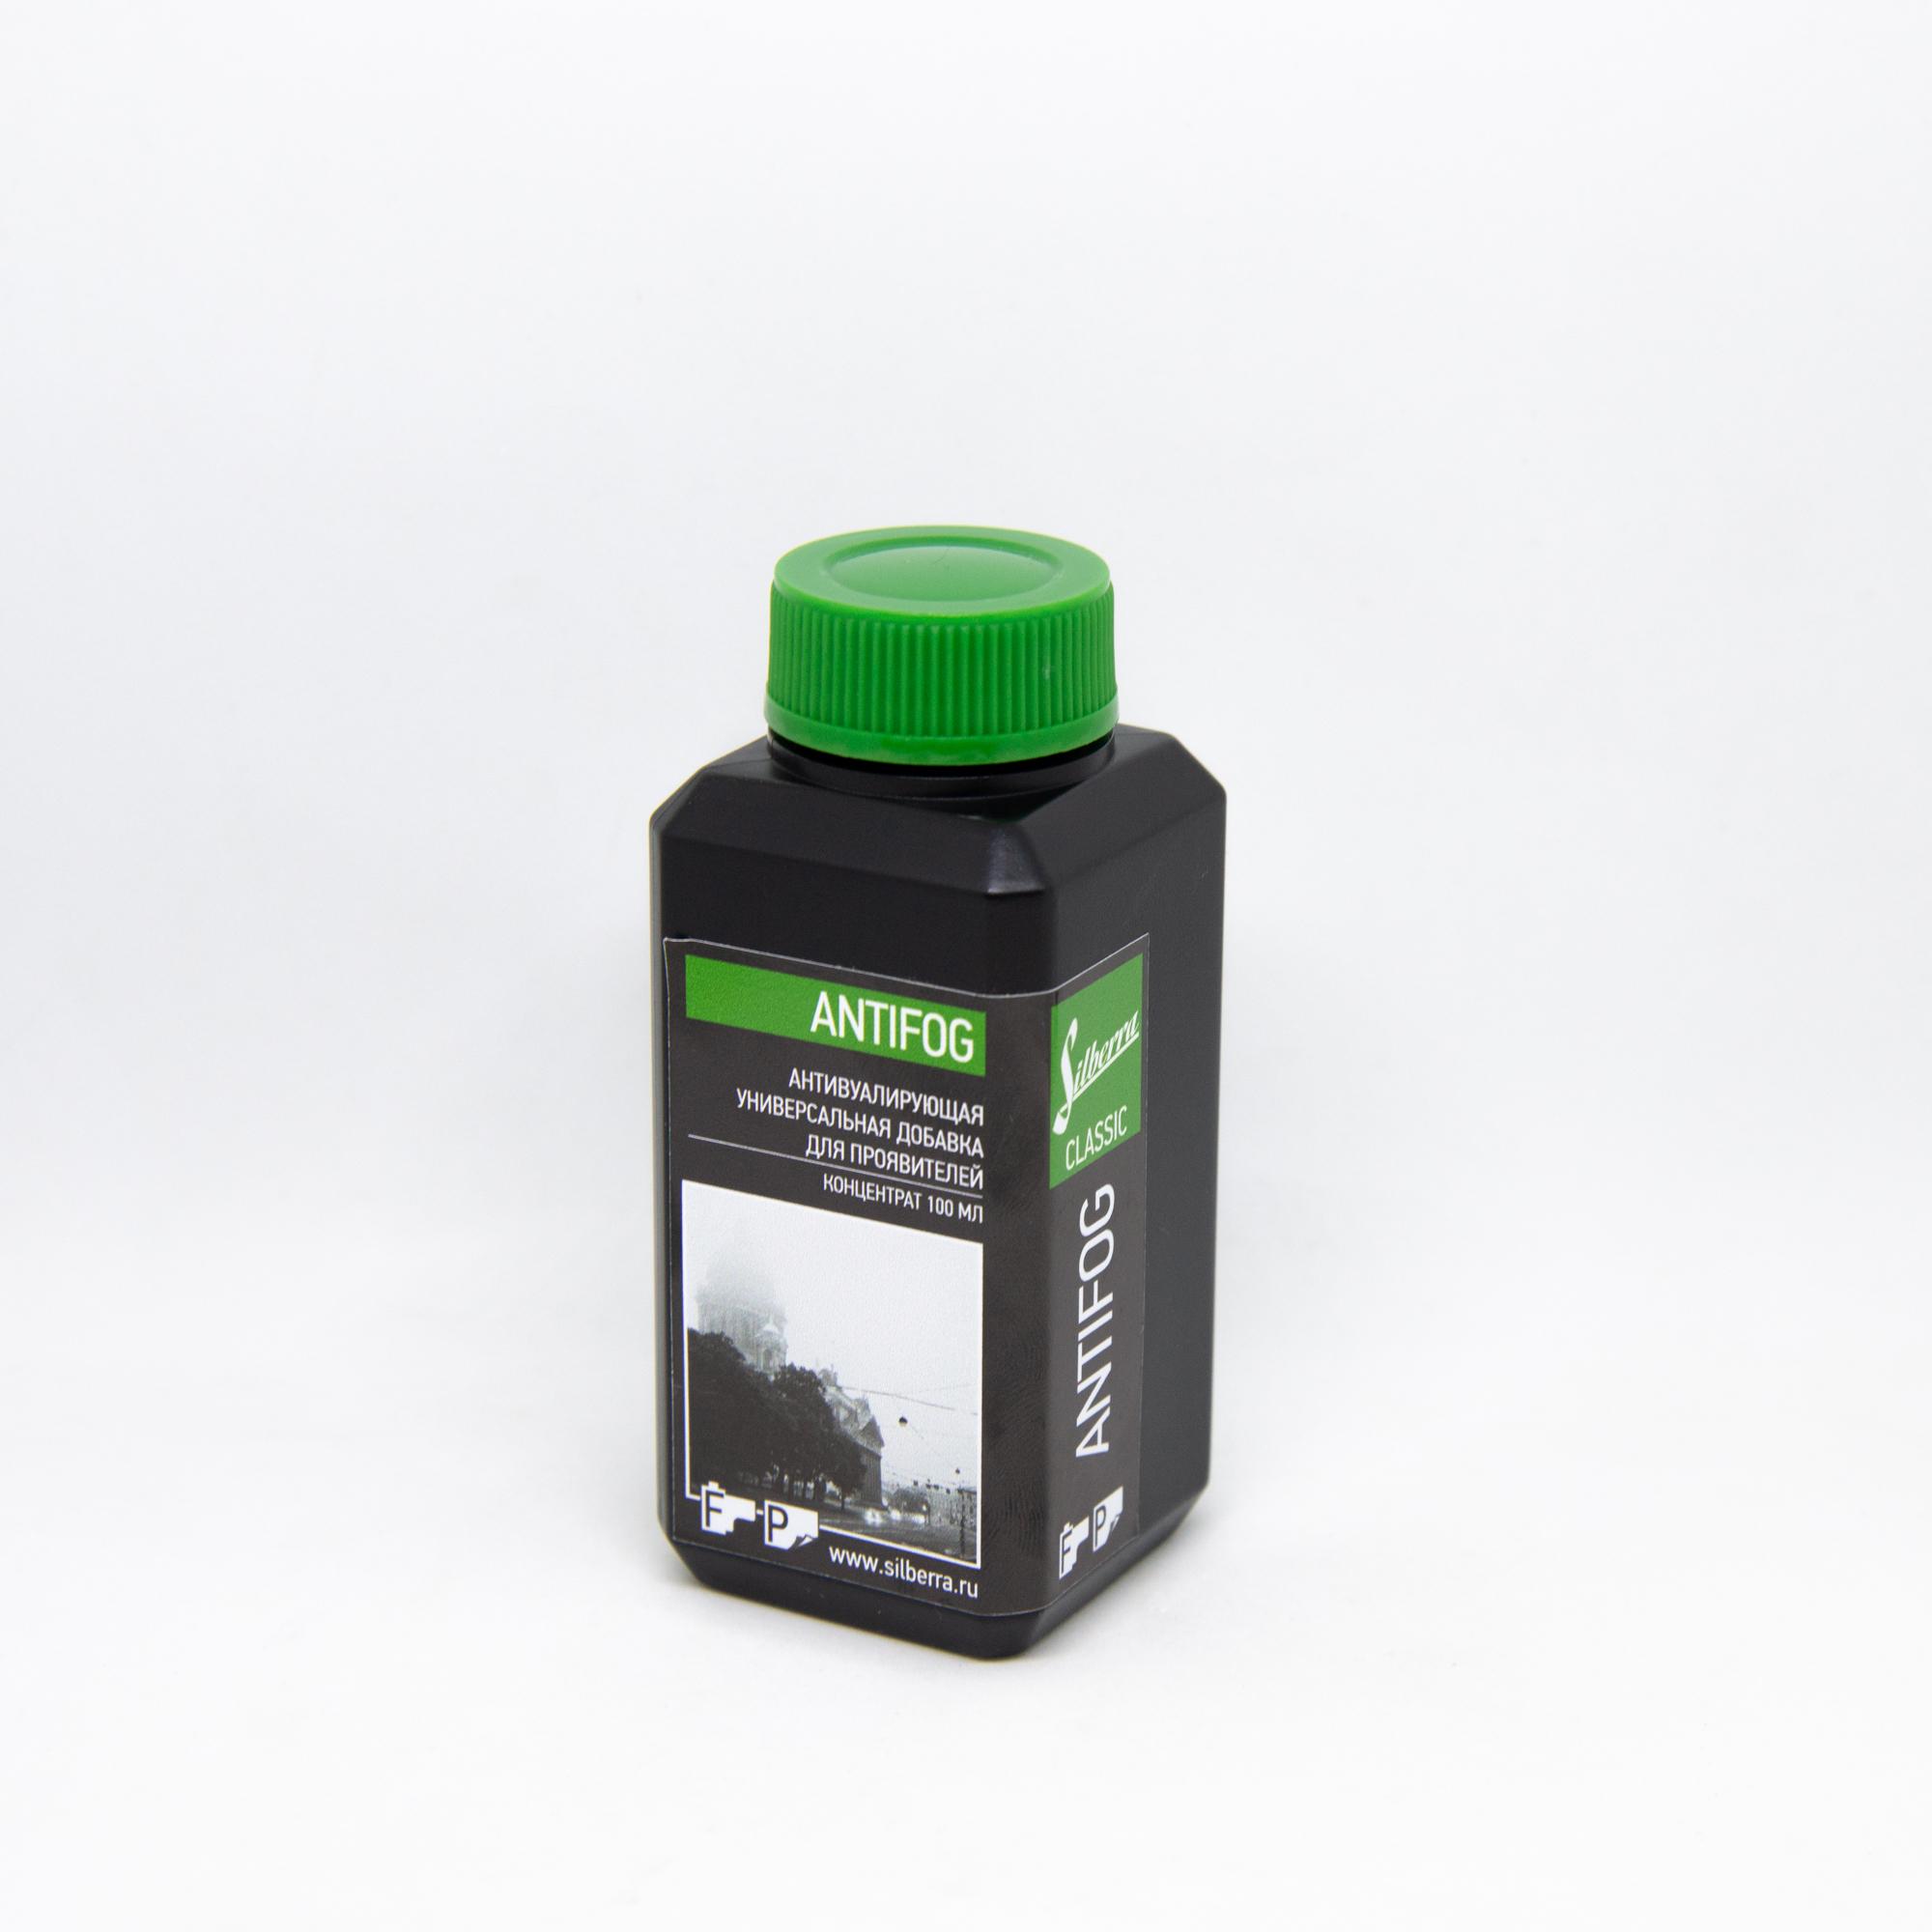 Антивуалирующая добавка Silberra Antifog, 100 мл